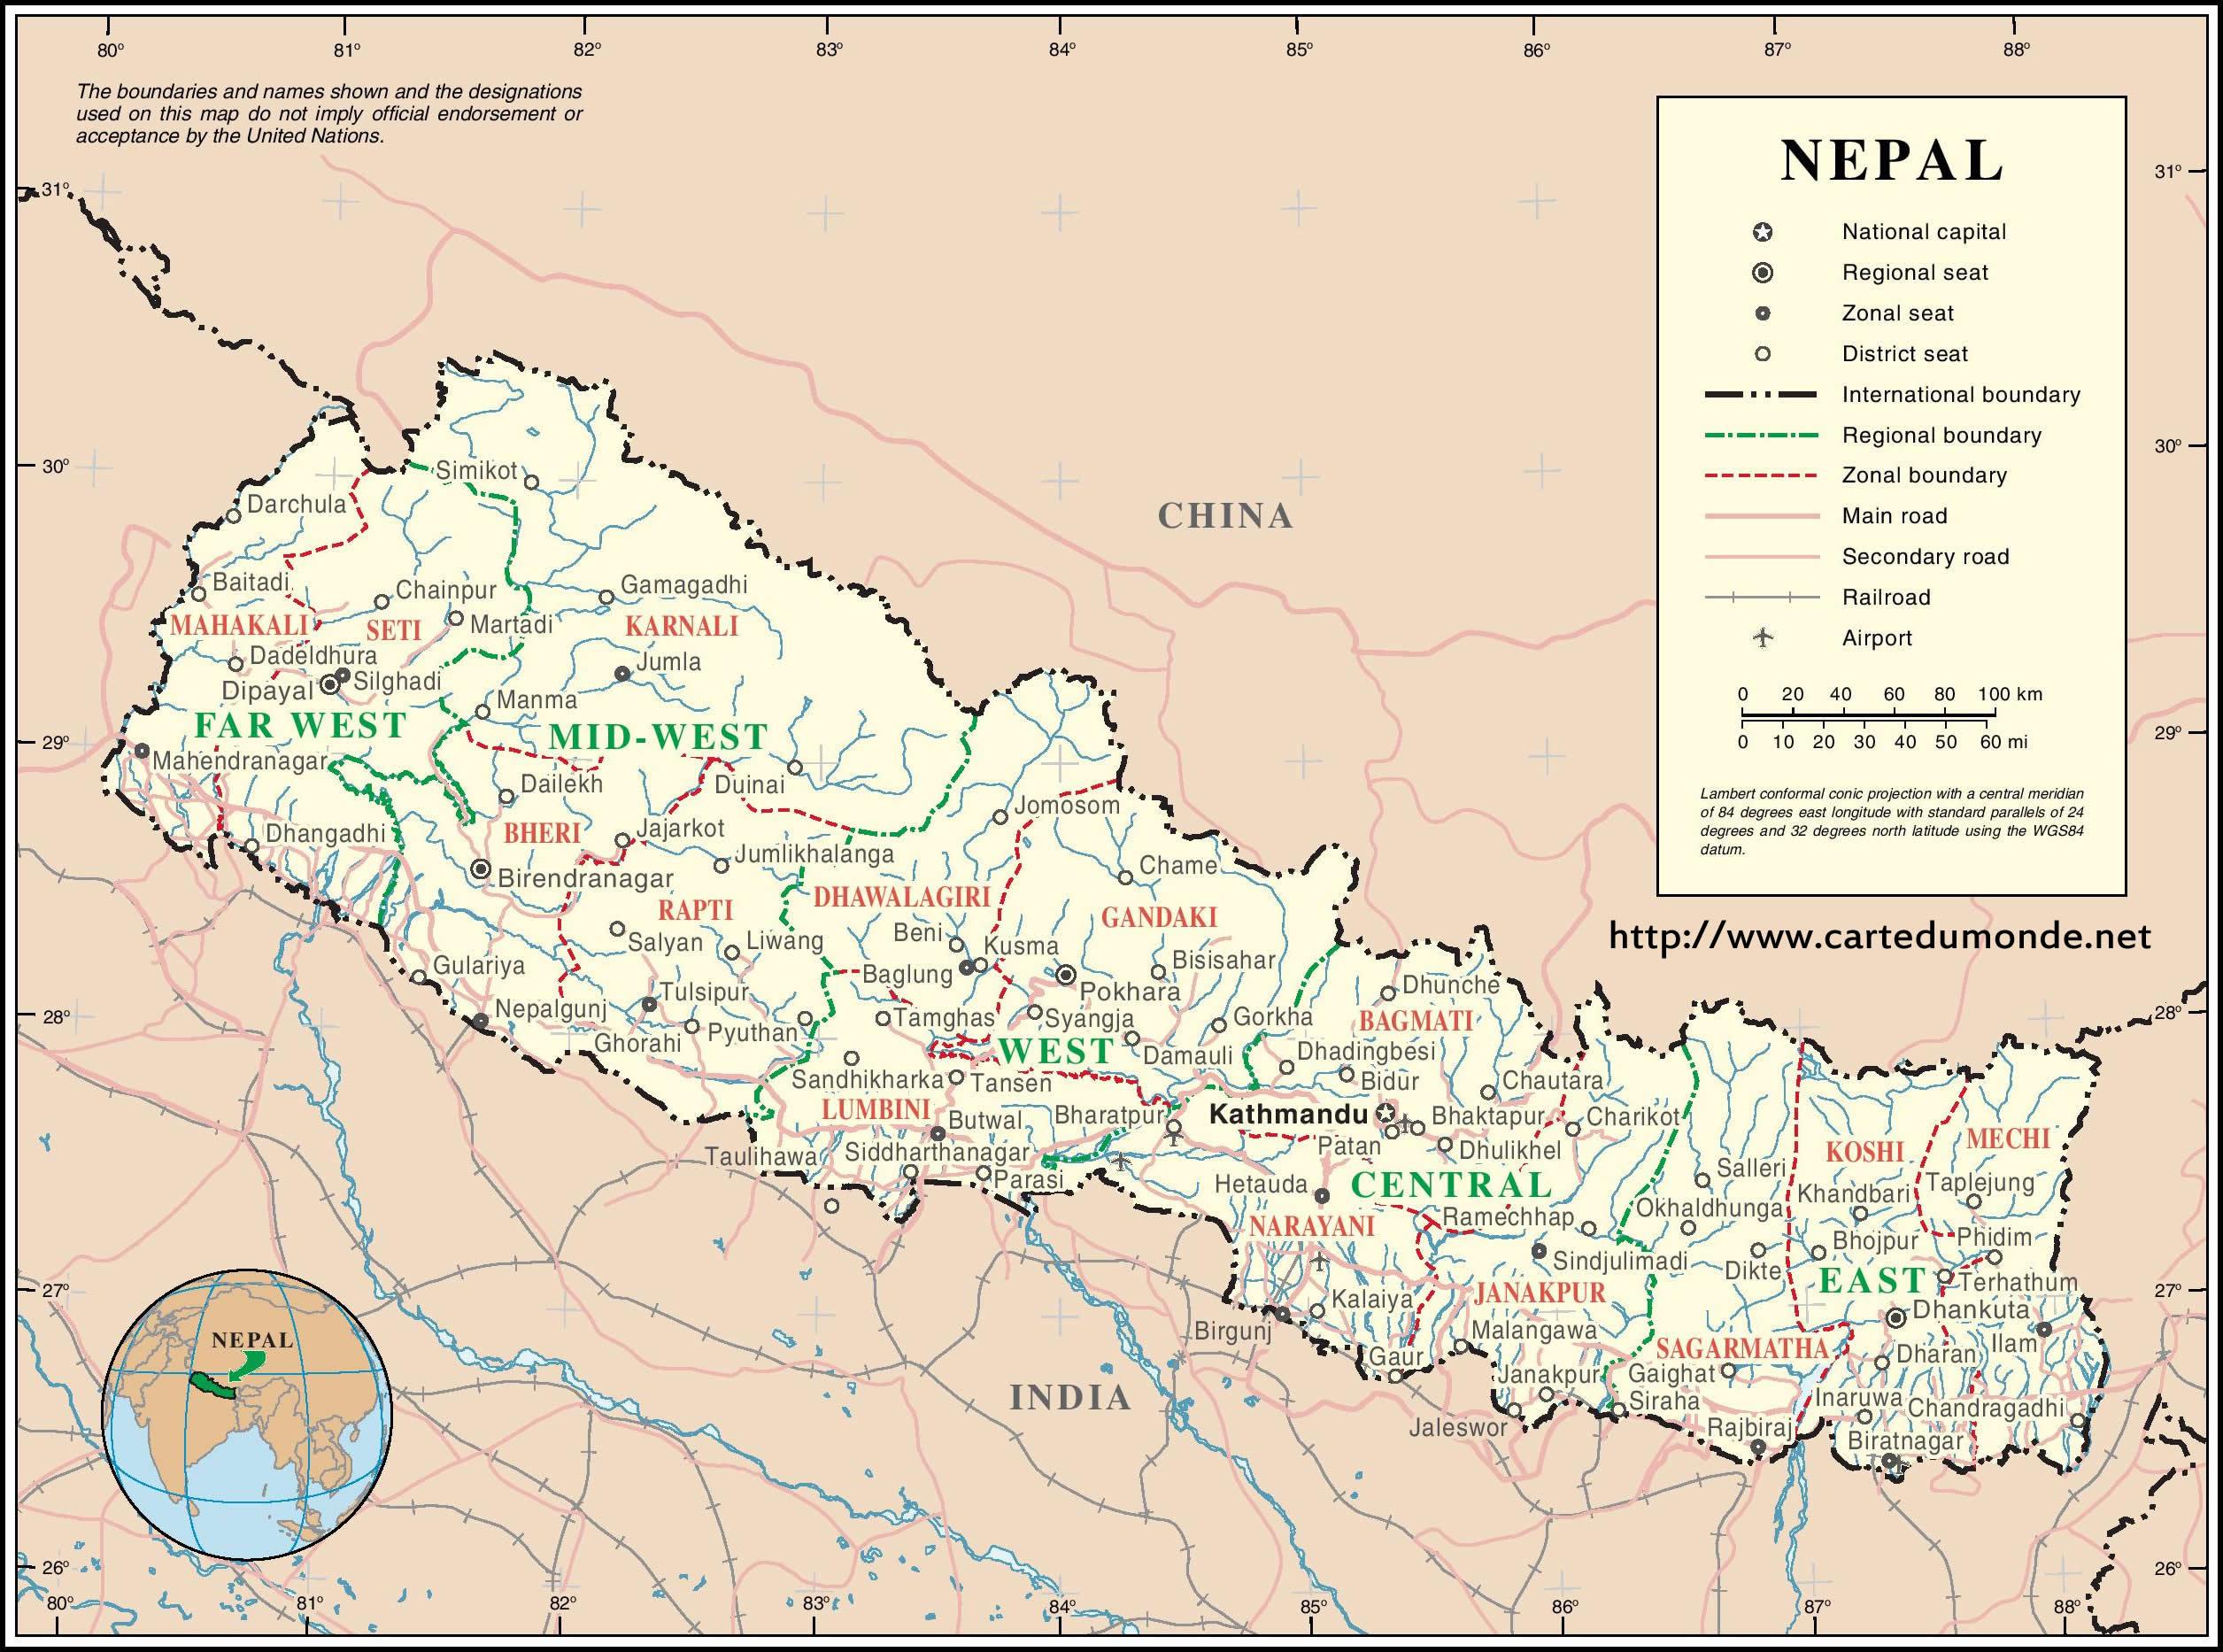 Agrandar el mapa Nepal en el mapa mundial